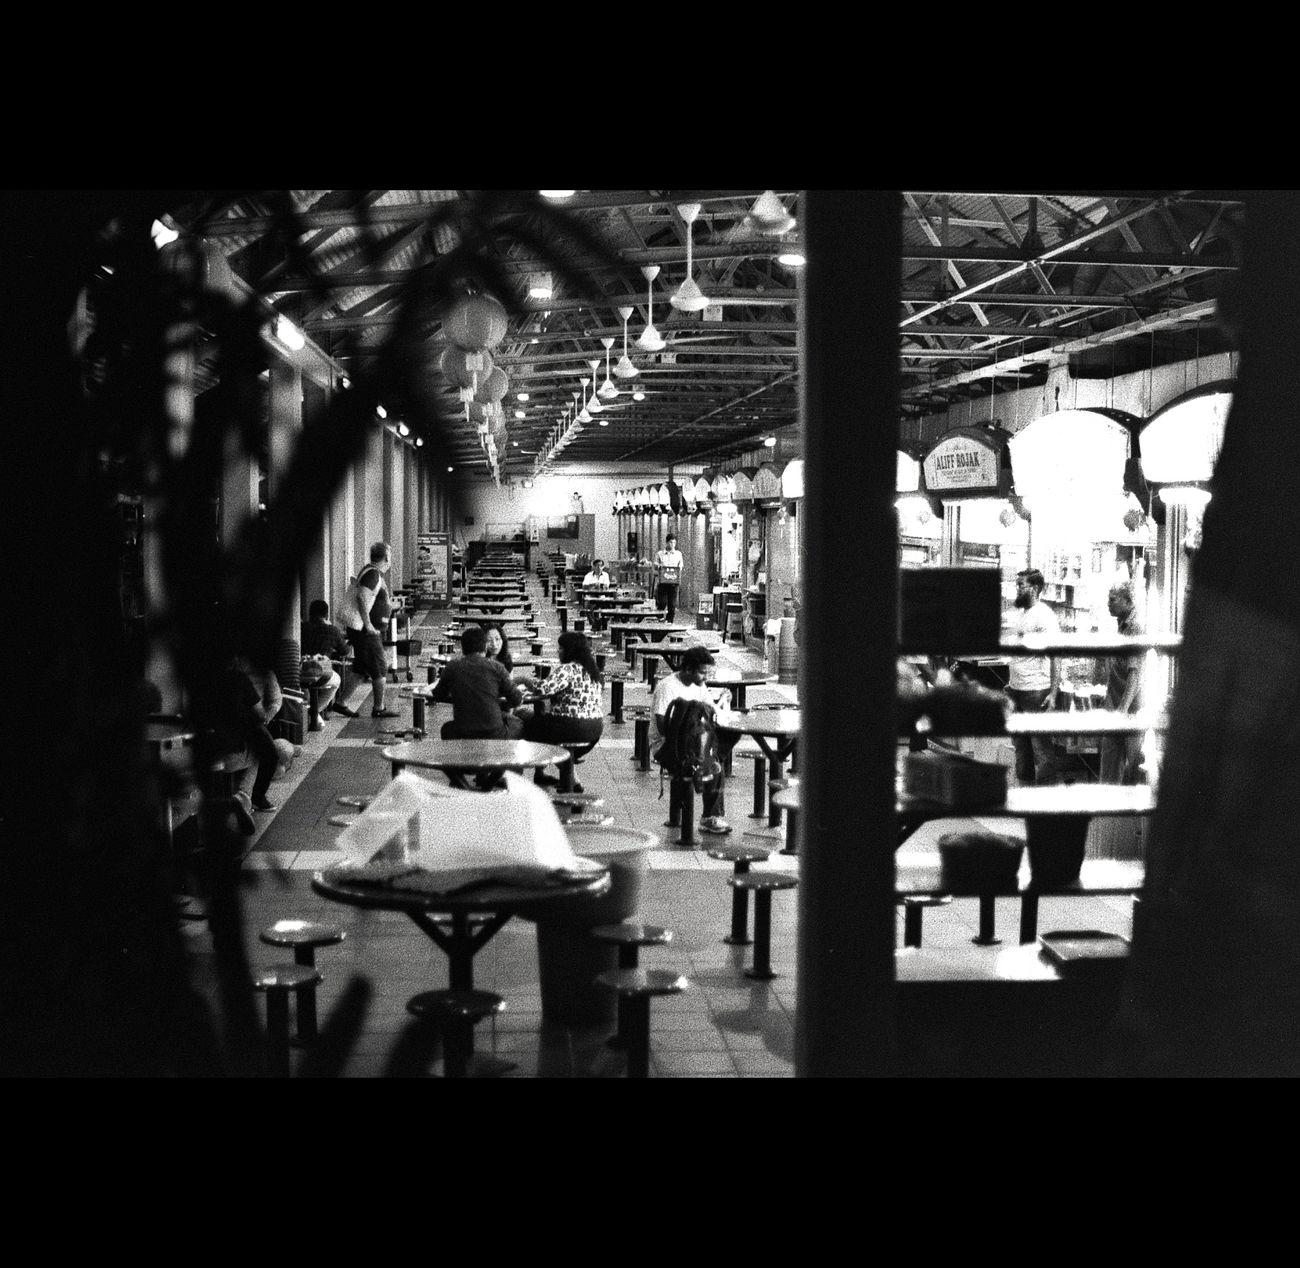 City Life Film Photography Filmcamera Emilrauschenberg Filmisnotdead EyeEmNewHere Arts Culture And Entertainment Leica Black And White Leica Lens Leica_camera